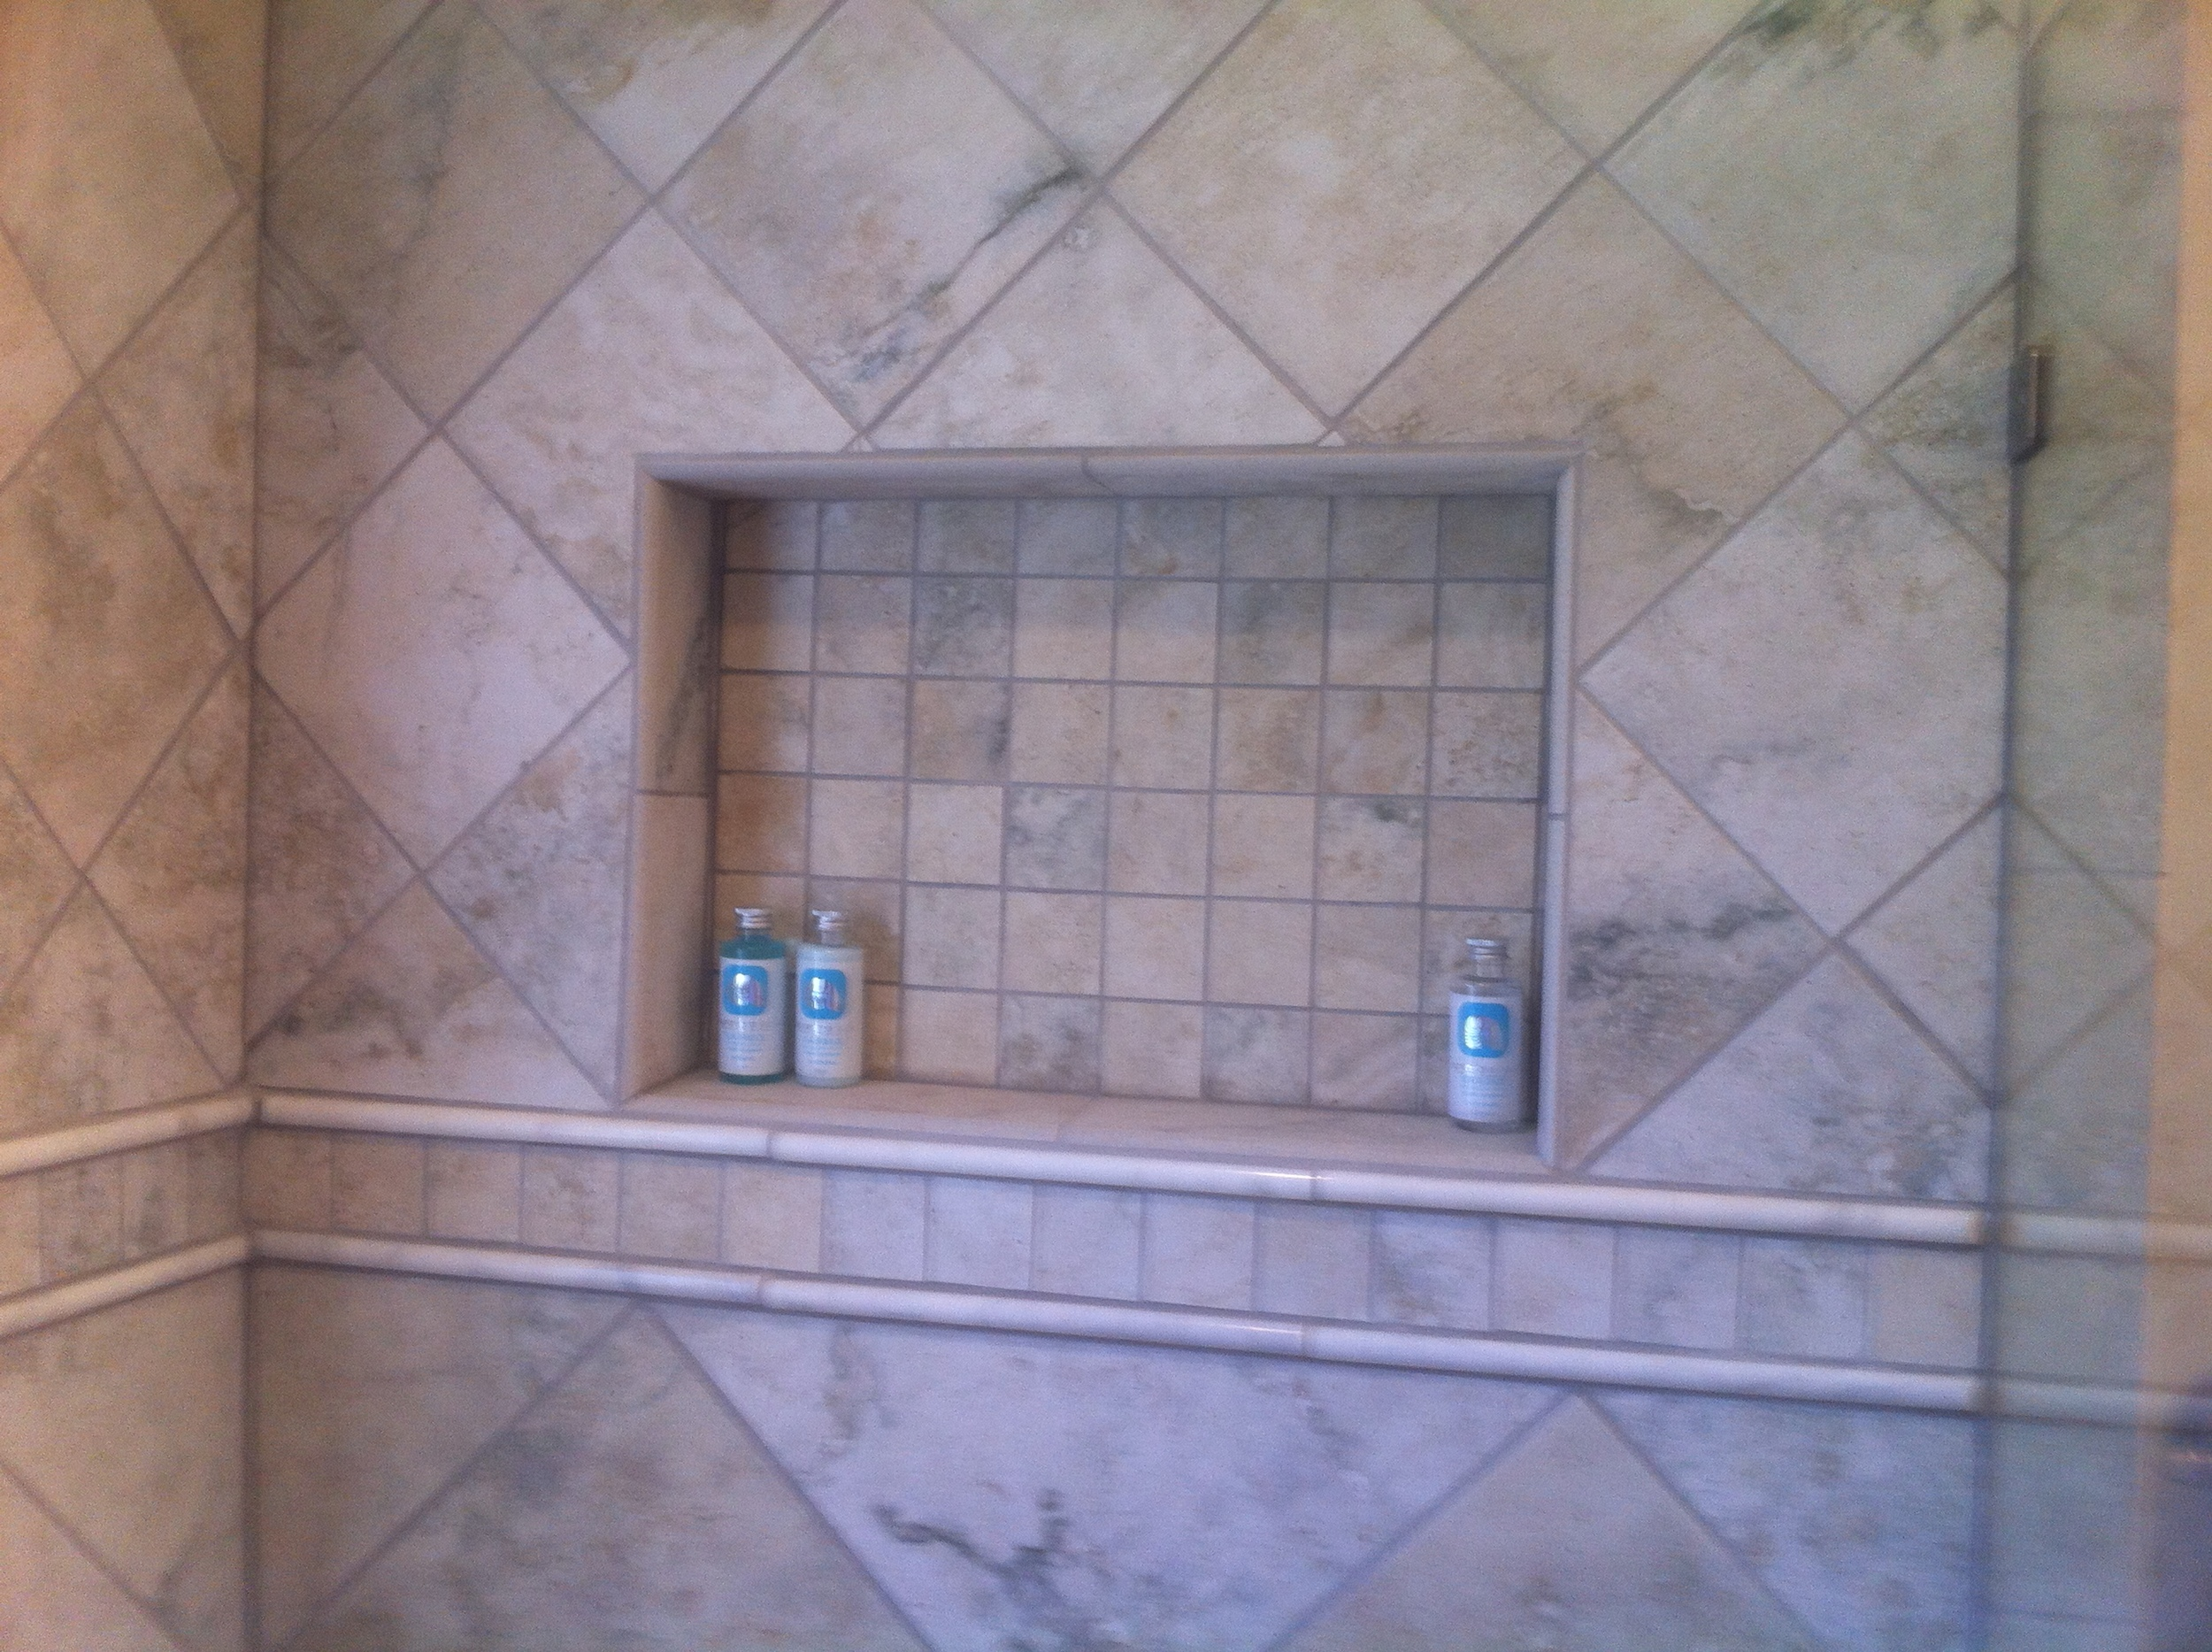 cvisions_bathroom_remodel23.JPG